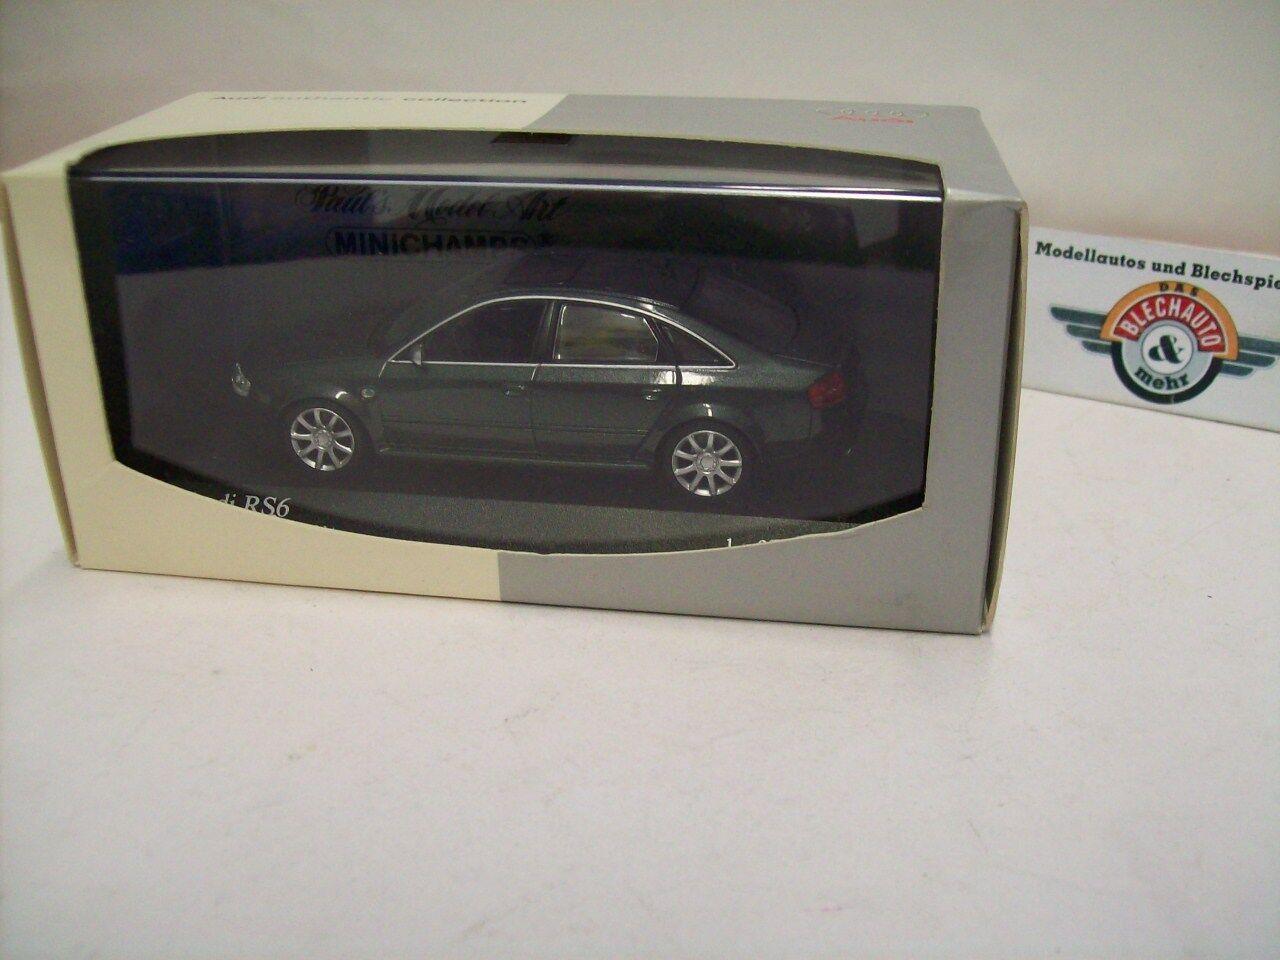 Audi RS6 (C5), 2002, Ebonyblack perleffekt, perleffekt, perleffekt, Audi-Dealer (Minichamps) 1 43, OVP bba525